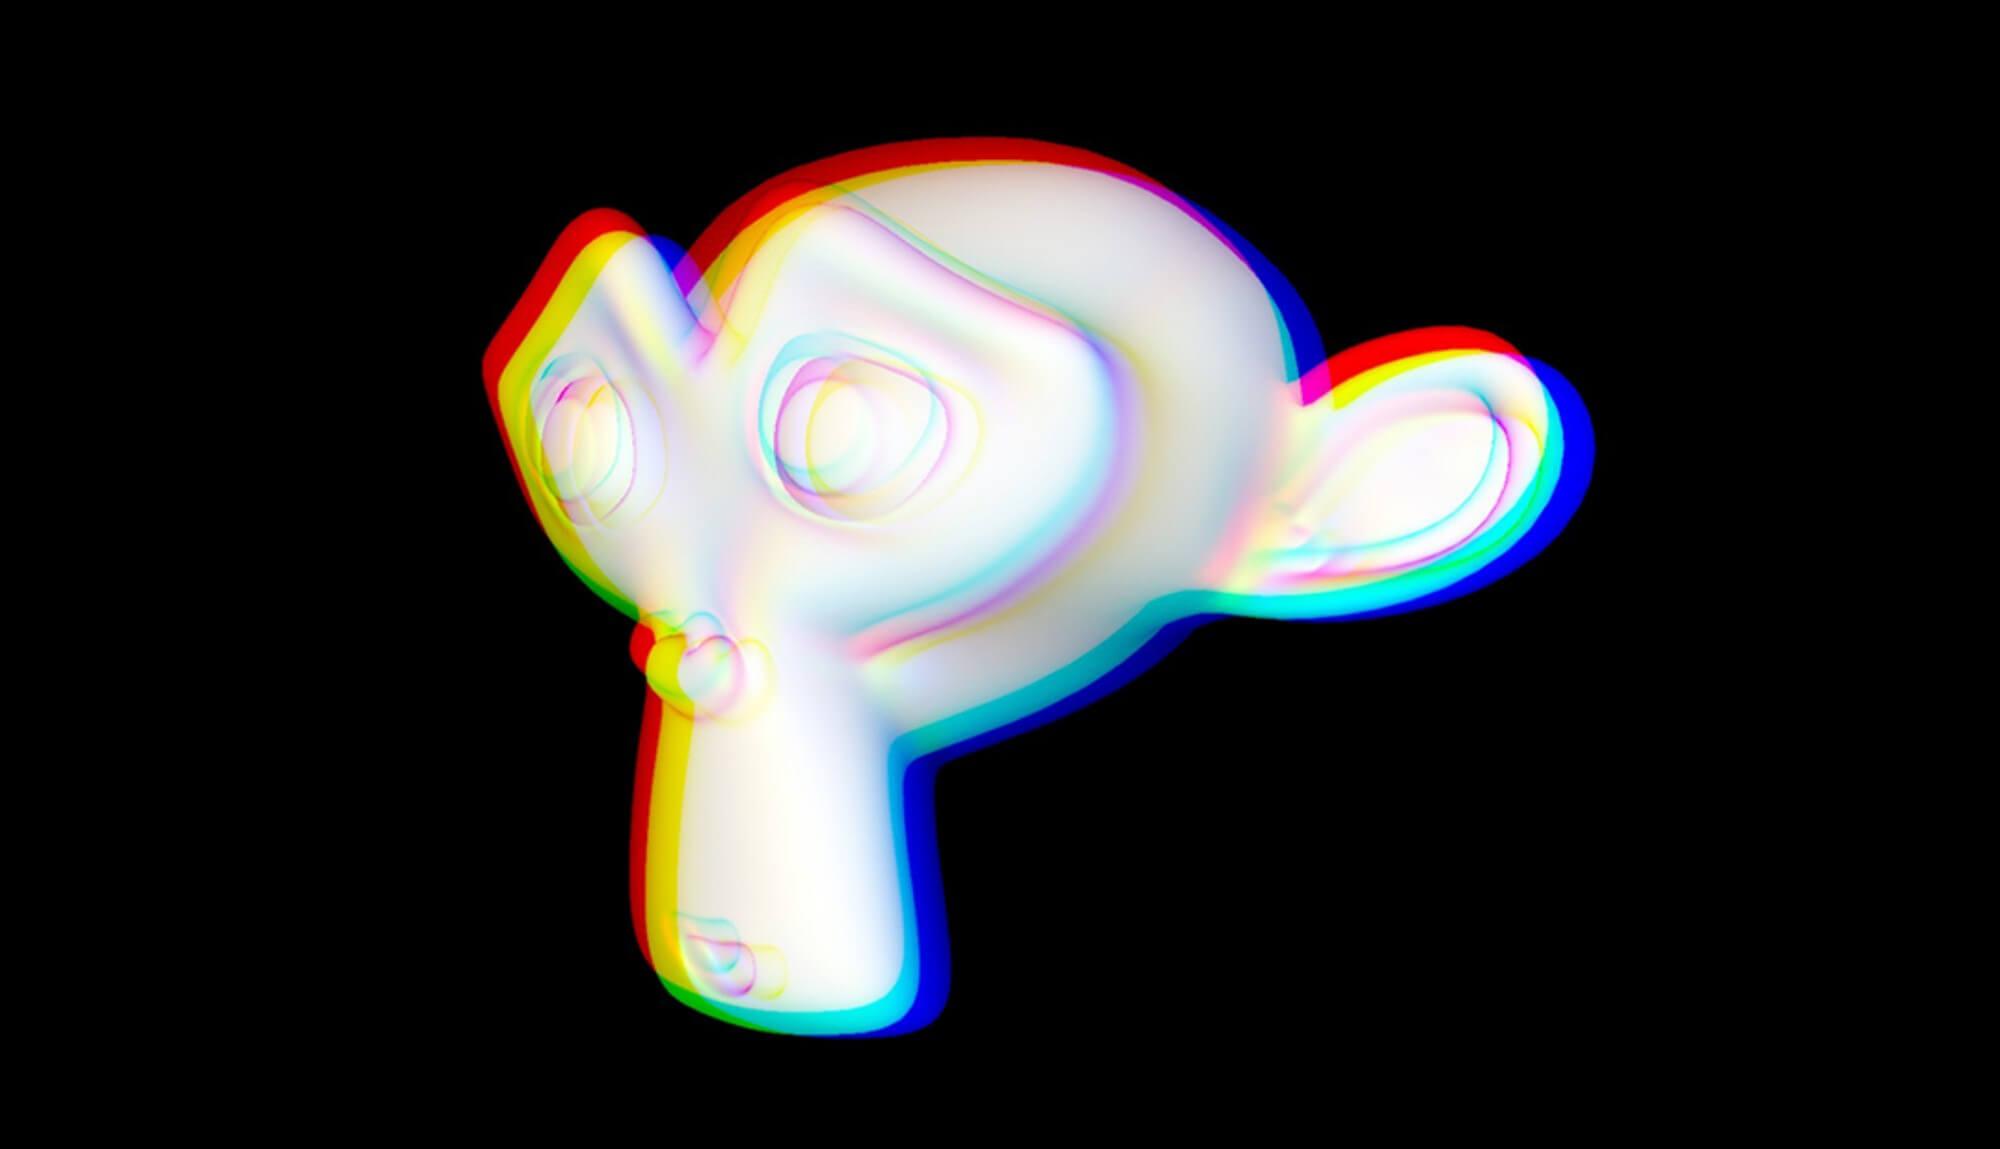 chromatic aberration demo